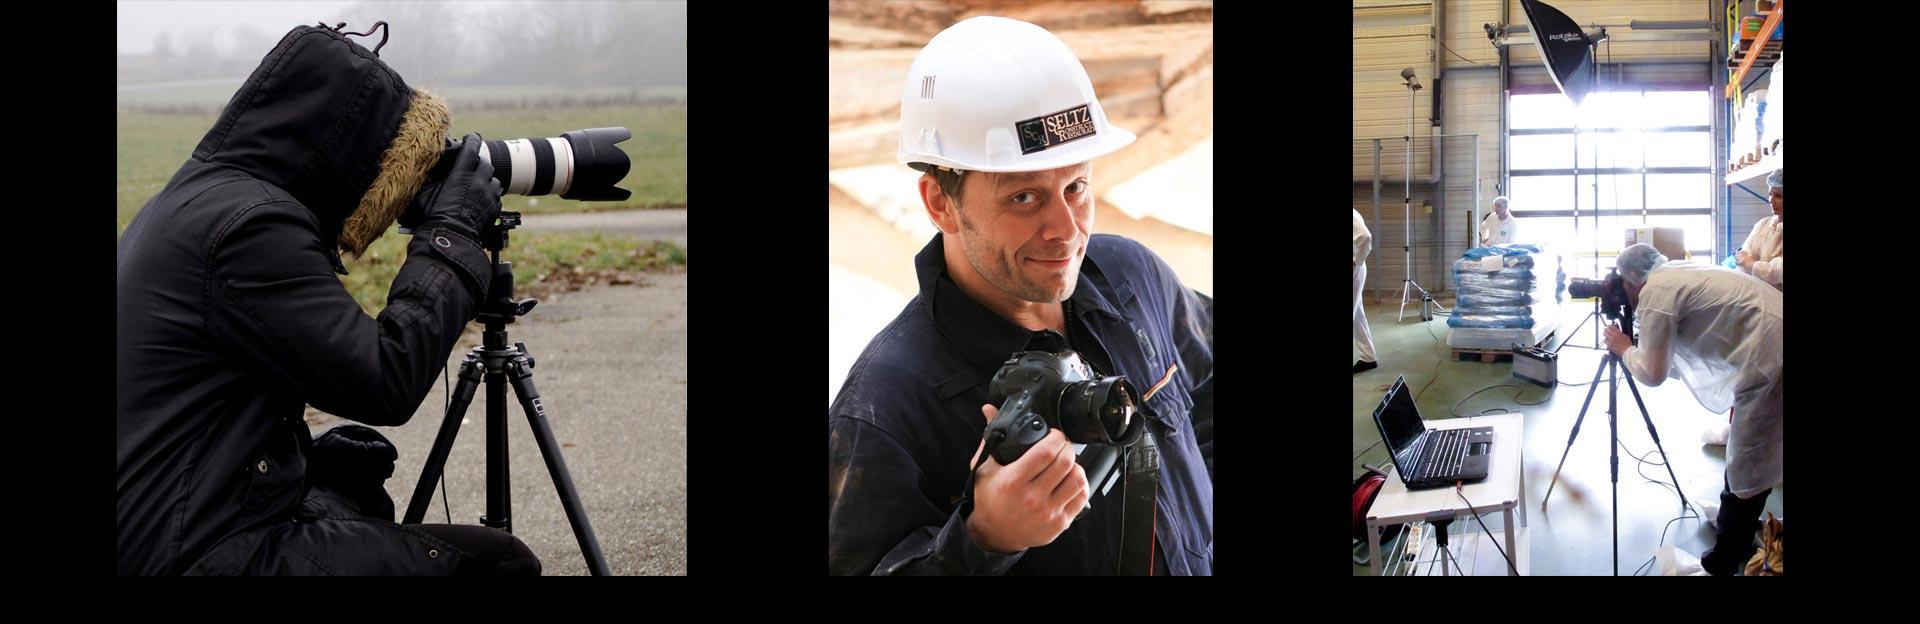 Photographe professionnel Strasbourg Bas-Rhin 67 - Stéphane FRANÇOIS